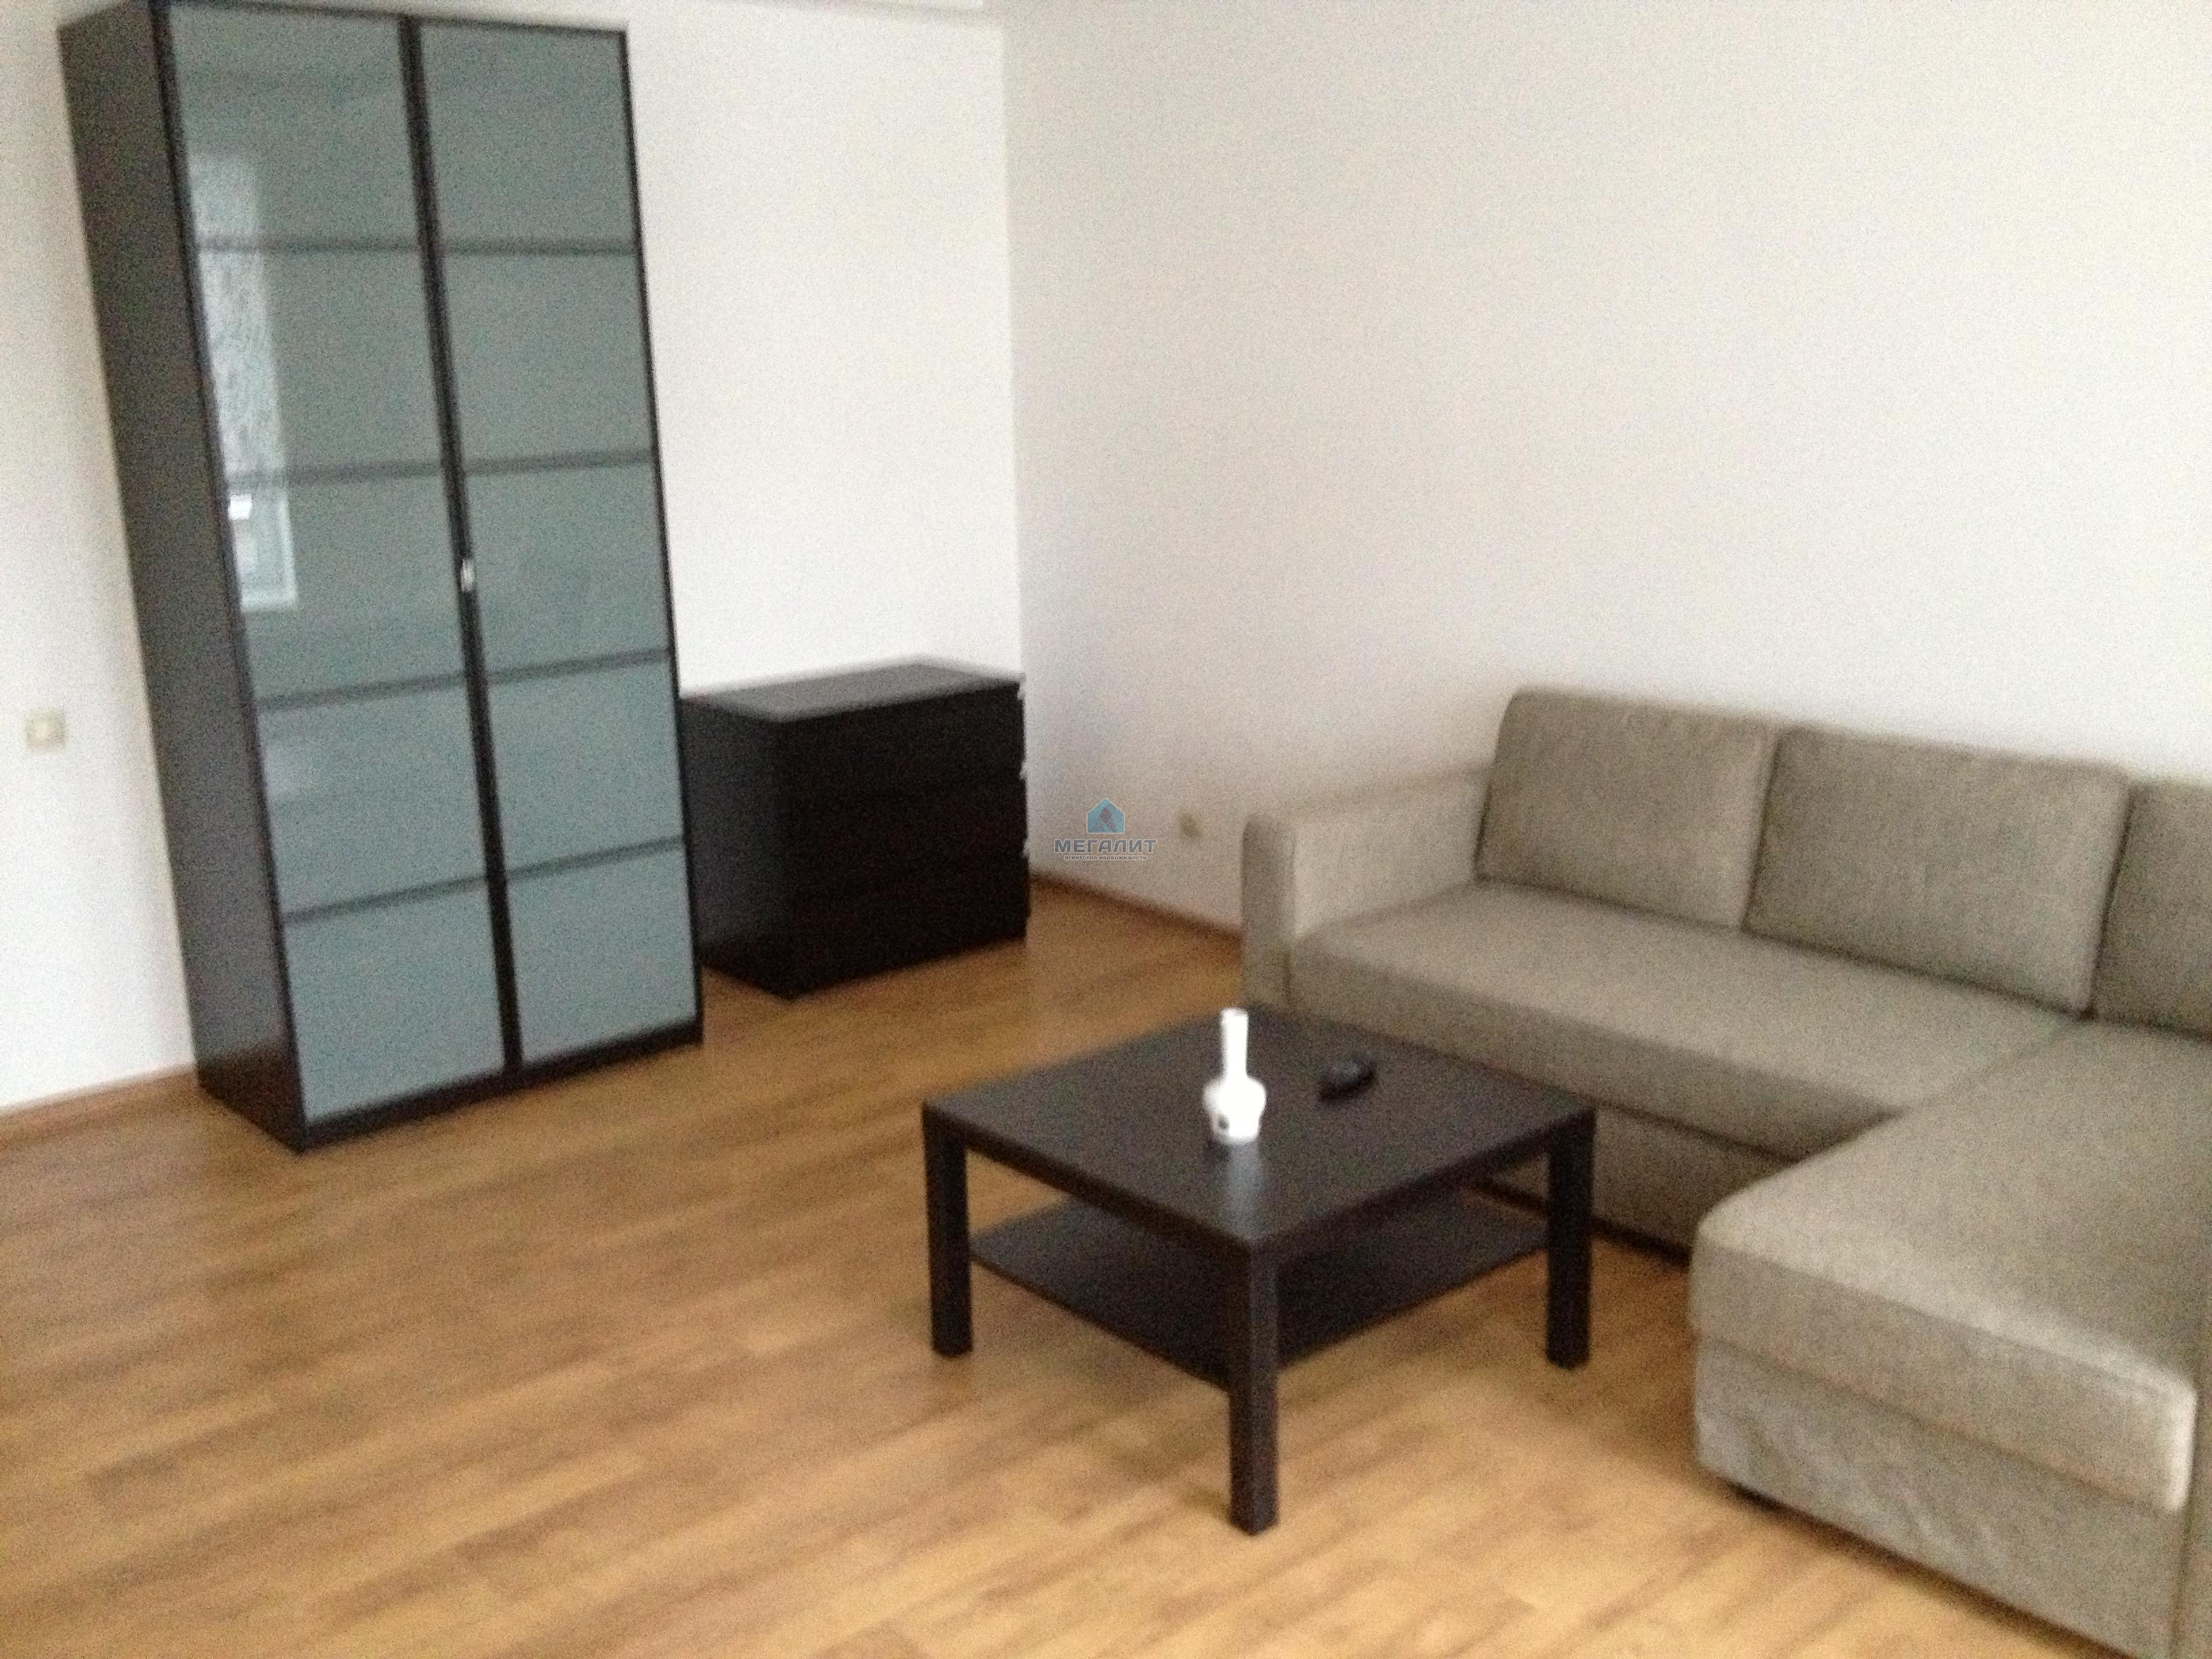 Аренда 1-к квартиры Николая Столярова 7, 37.0 м² (миниатюра №2)